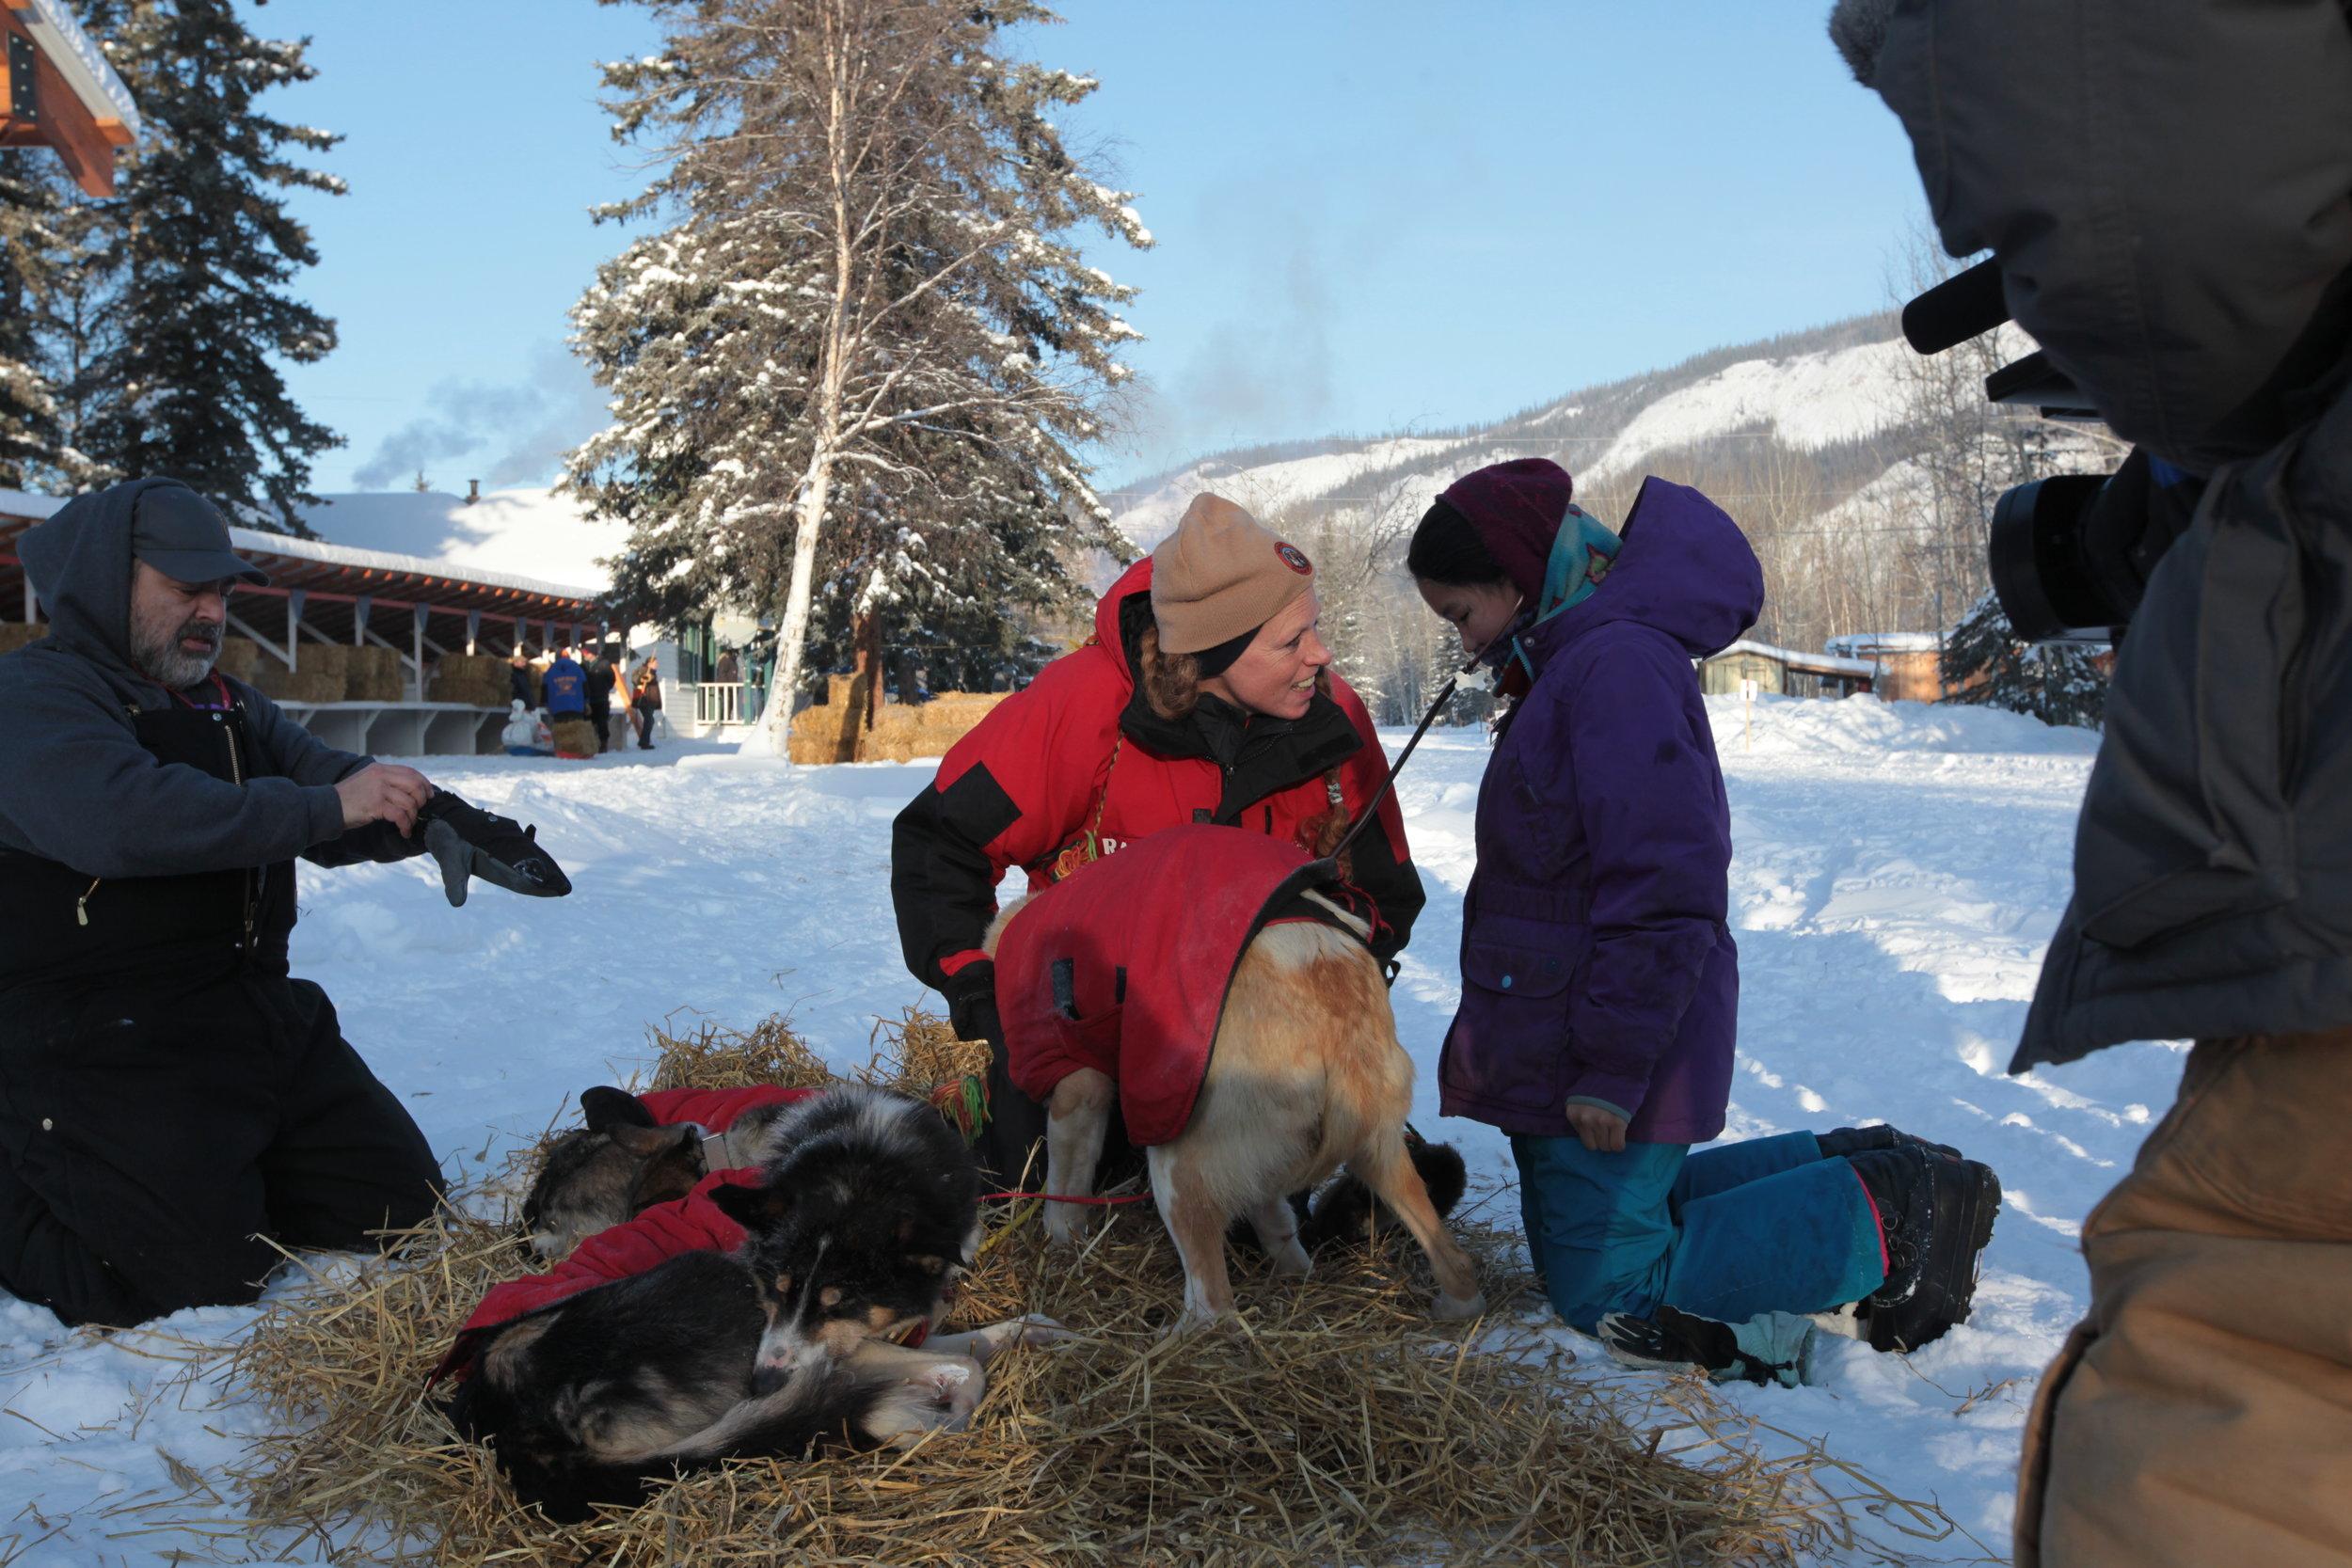 Yukon Quest/Culture Week in Eagle, February 2017